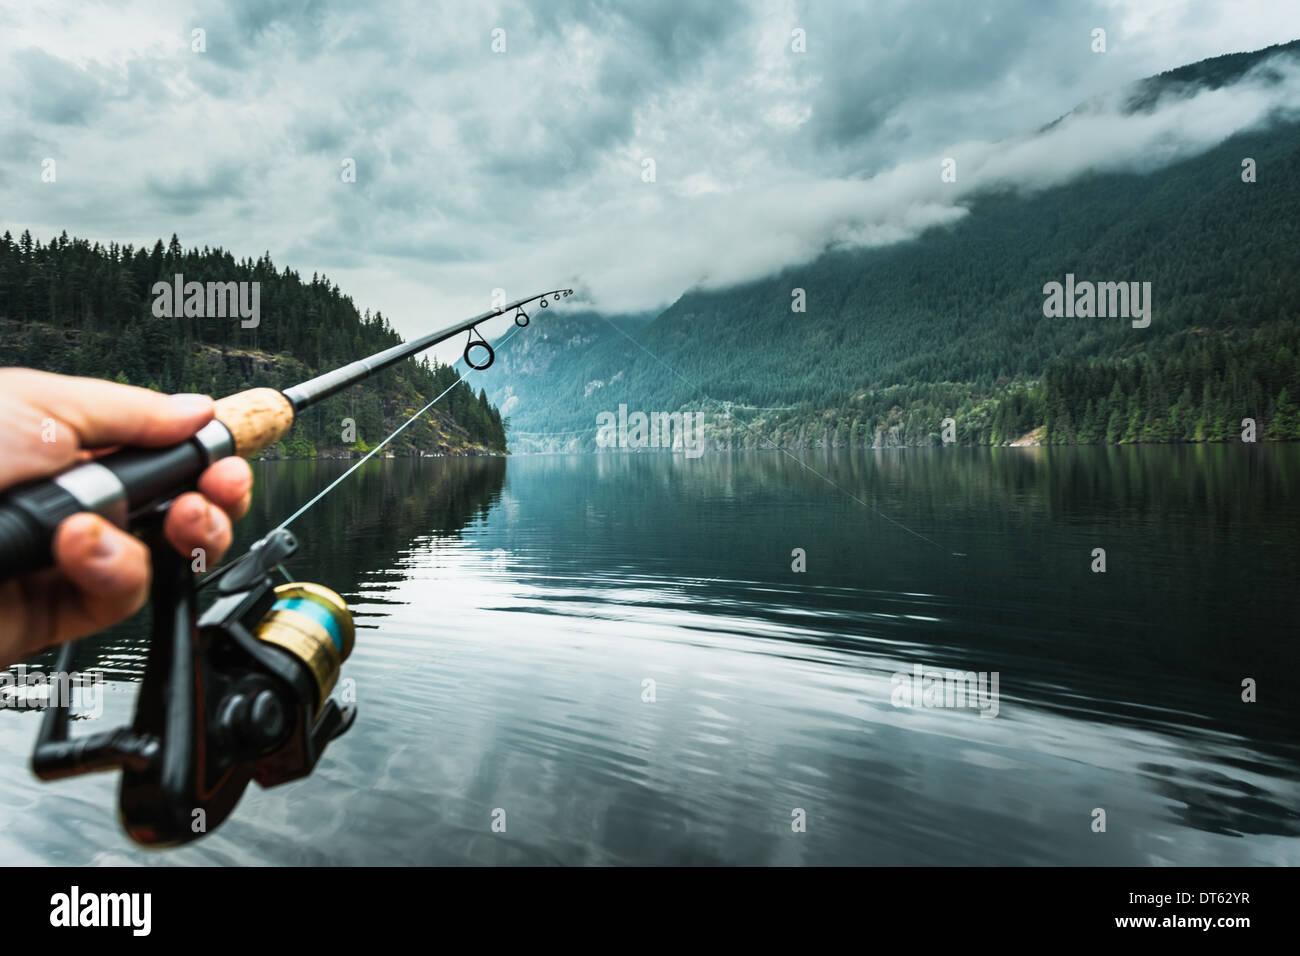 Mann mit Angelrute Nahaufnahme, Buntzen Lake, British Columbia, Kanada Stockbild